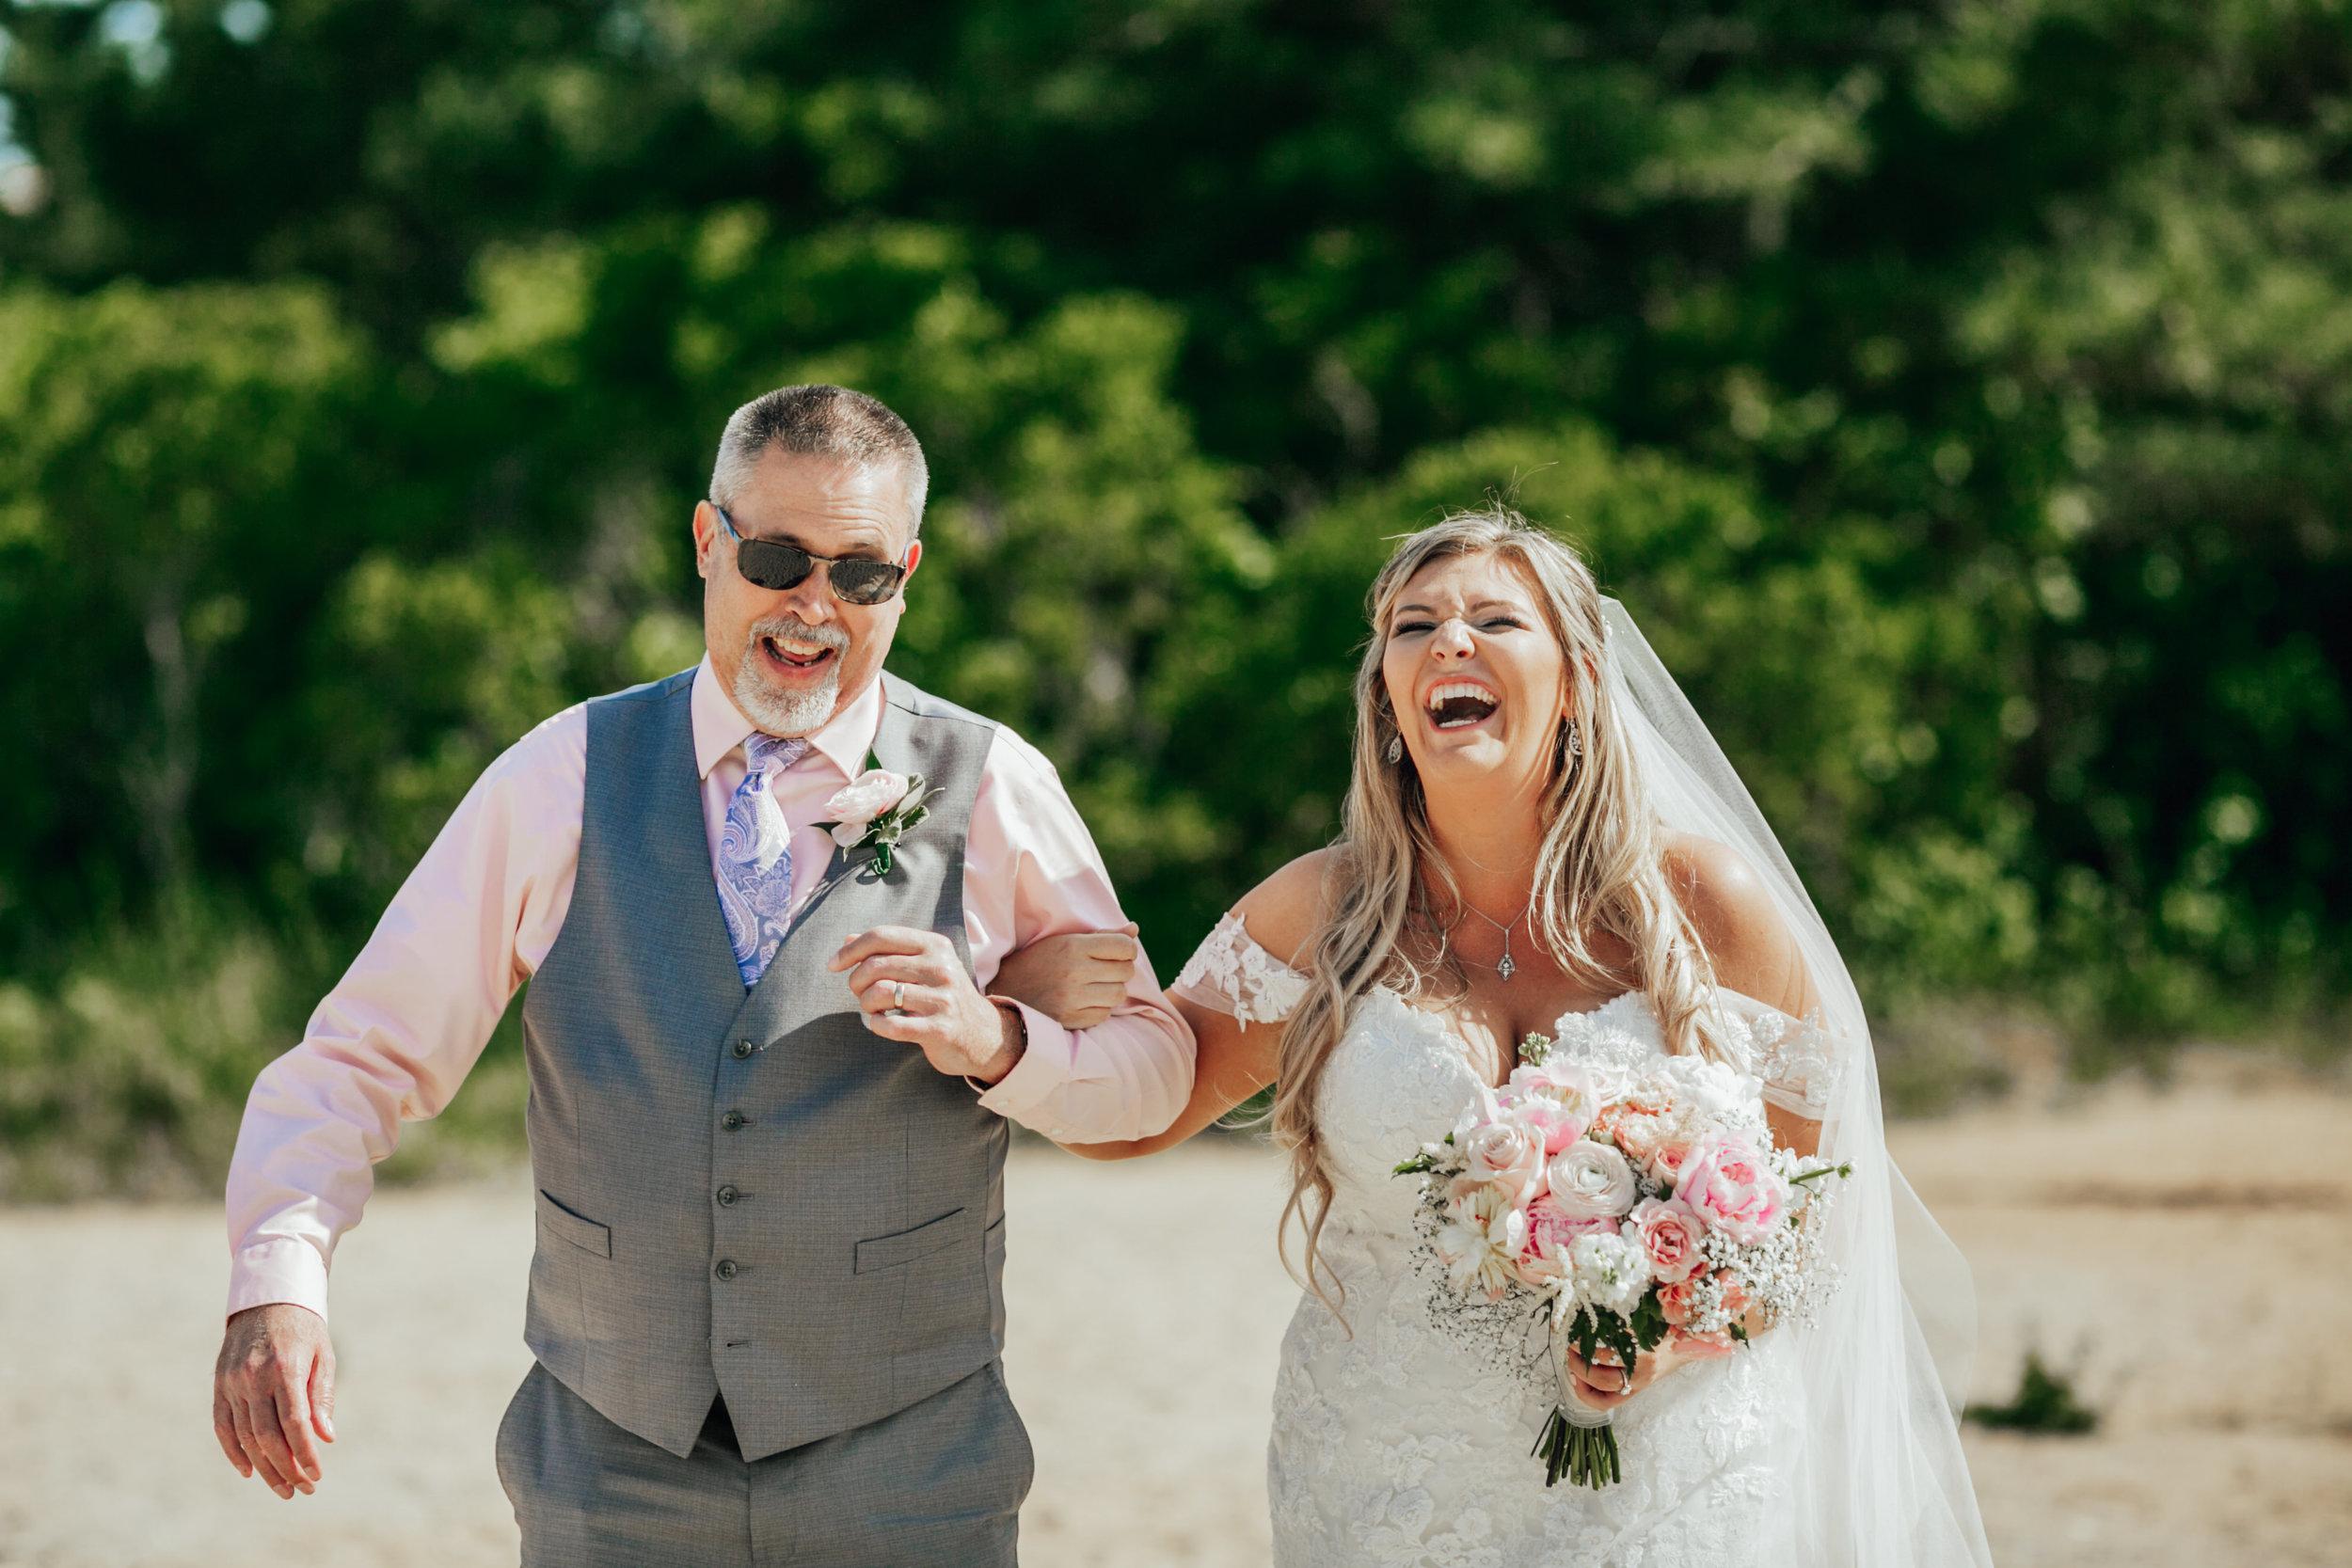 New Jersey Wedding Photographer, Felsberg Photography LBI wedding photography 62.jpg